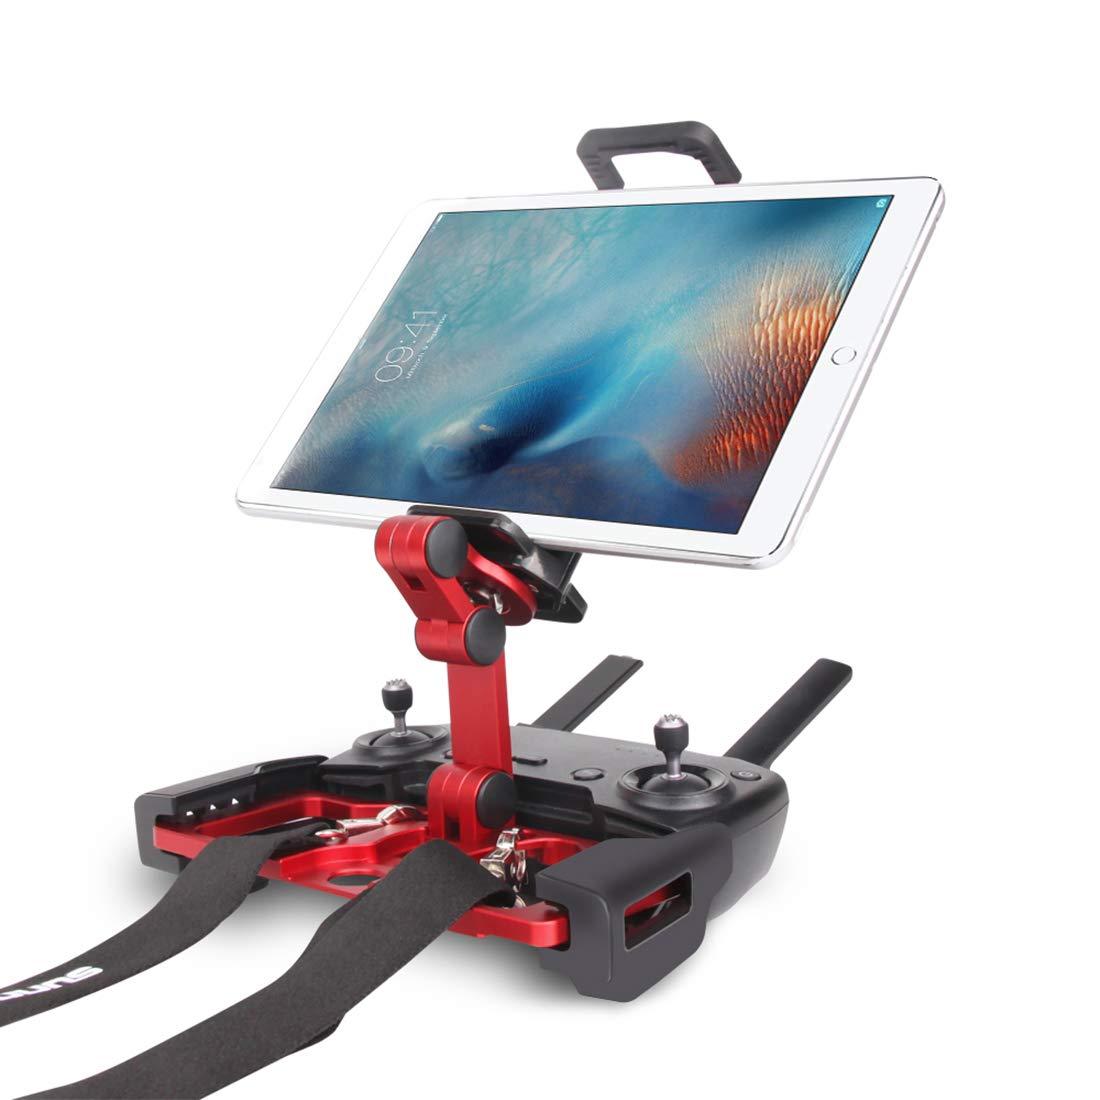 Petforu Tablet Bracket Aluminium Alloy Folding Remote Control Phone iPad Holder for DJI Mavic Air/Spark /Mavic 2 Pro/Mavic 2 Zoom